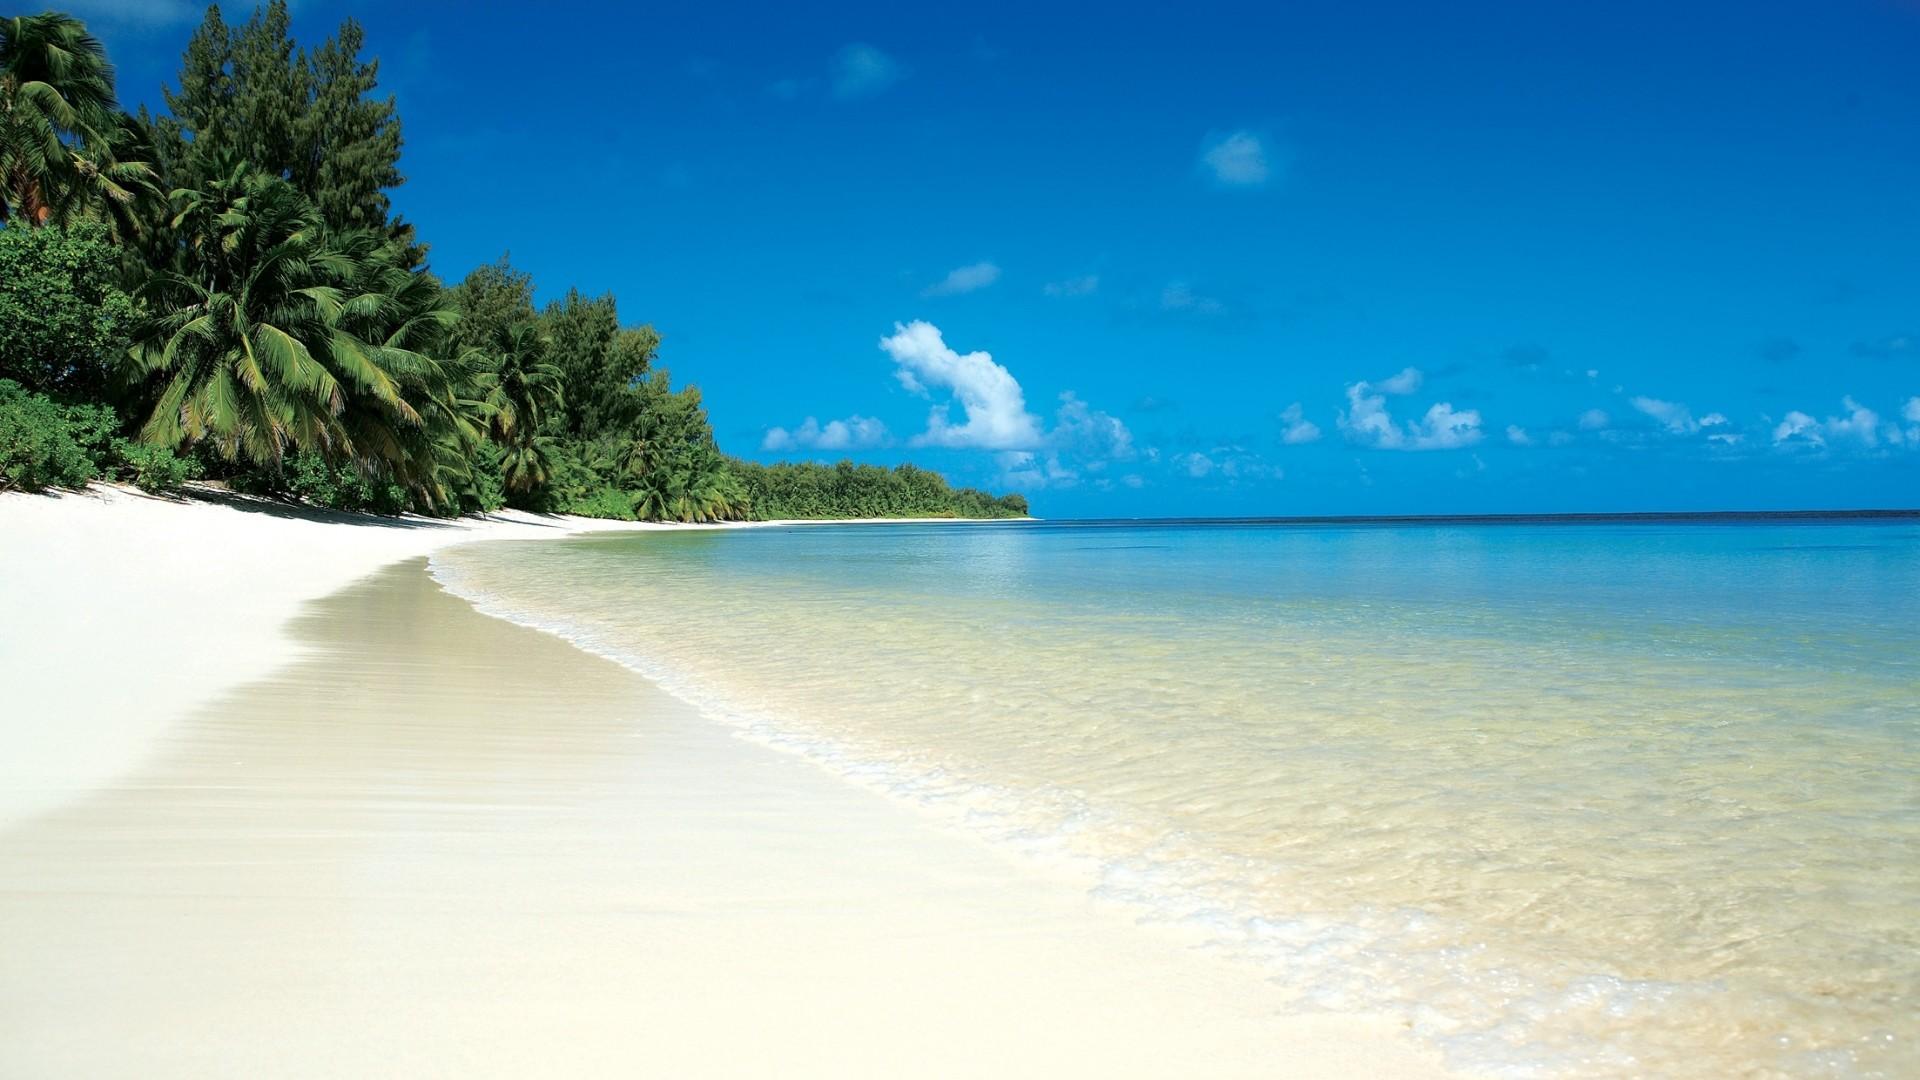 Preview wallpaper beach, tropics, sand, white, palm trees, relax 1920×1080